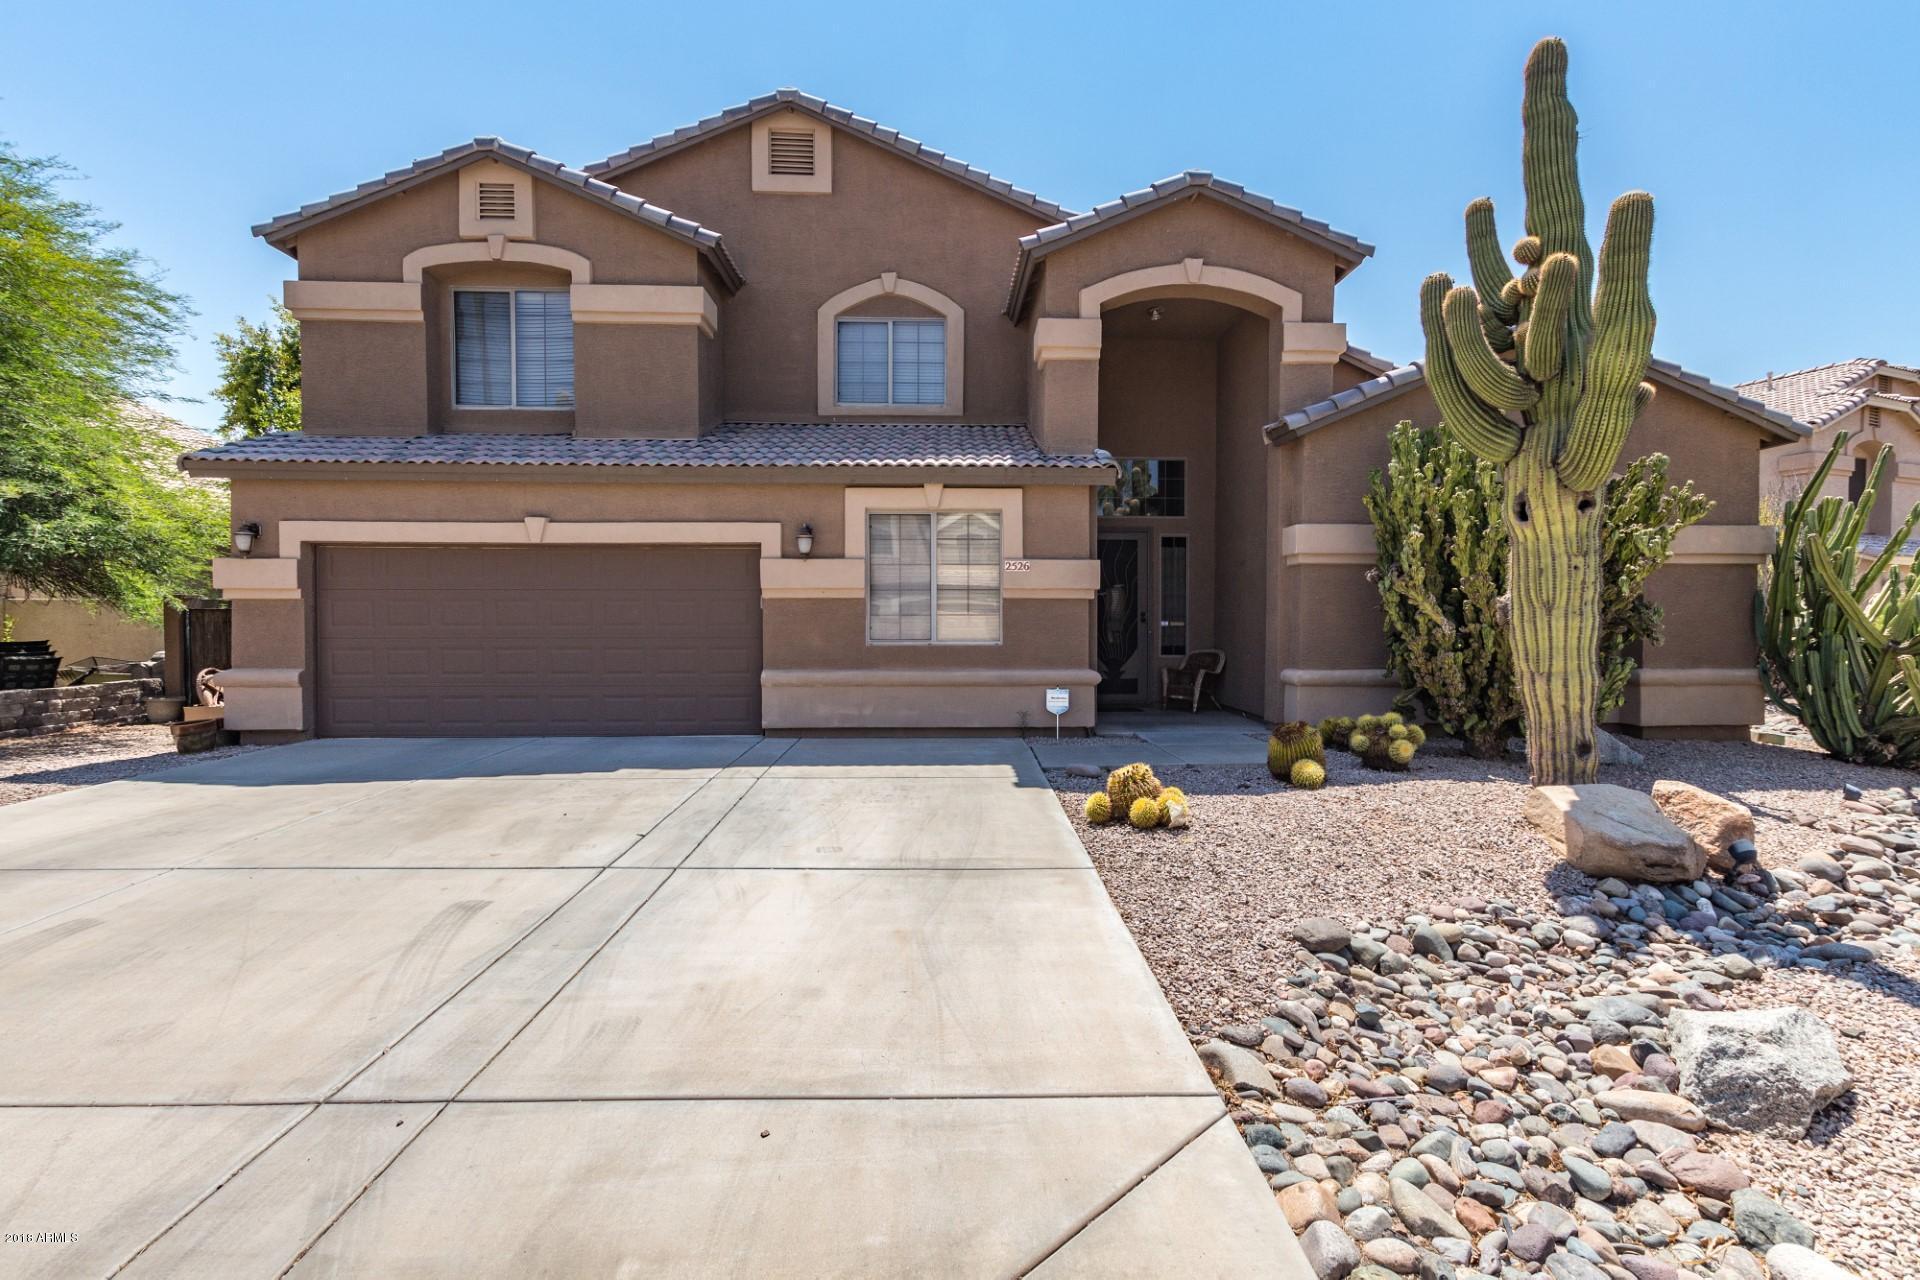 Photo of 2526 S JEFFERSON --, Mesa, AZ 85209